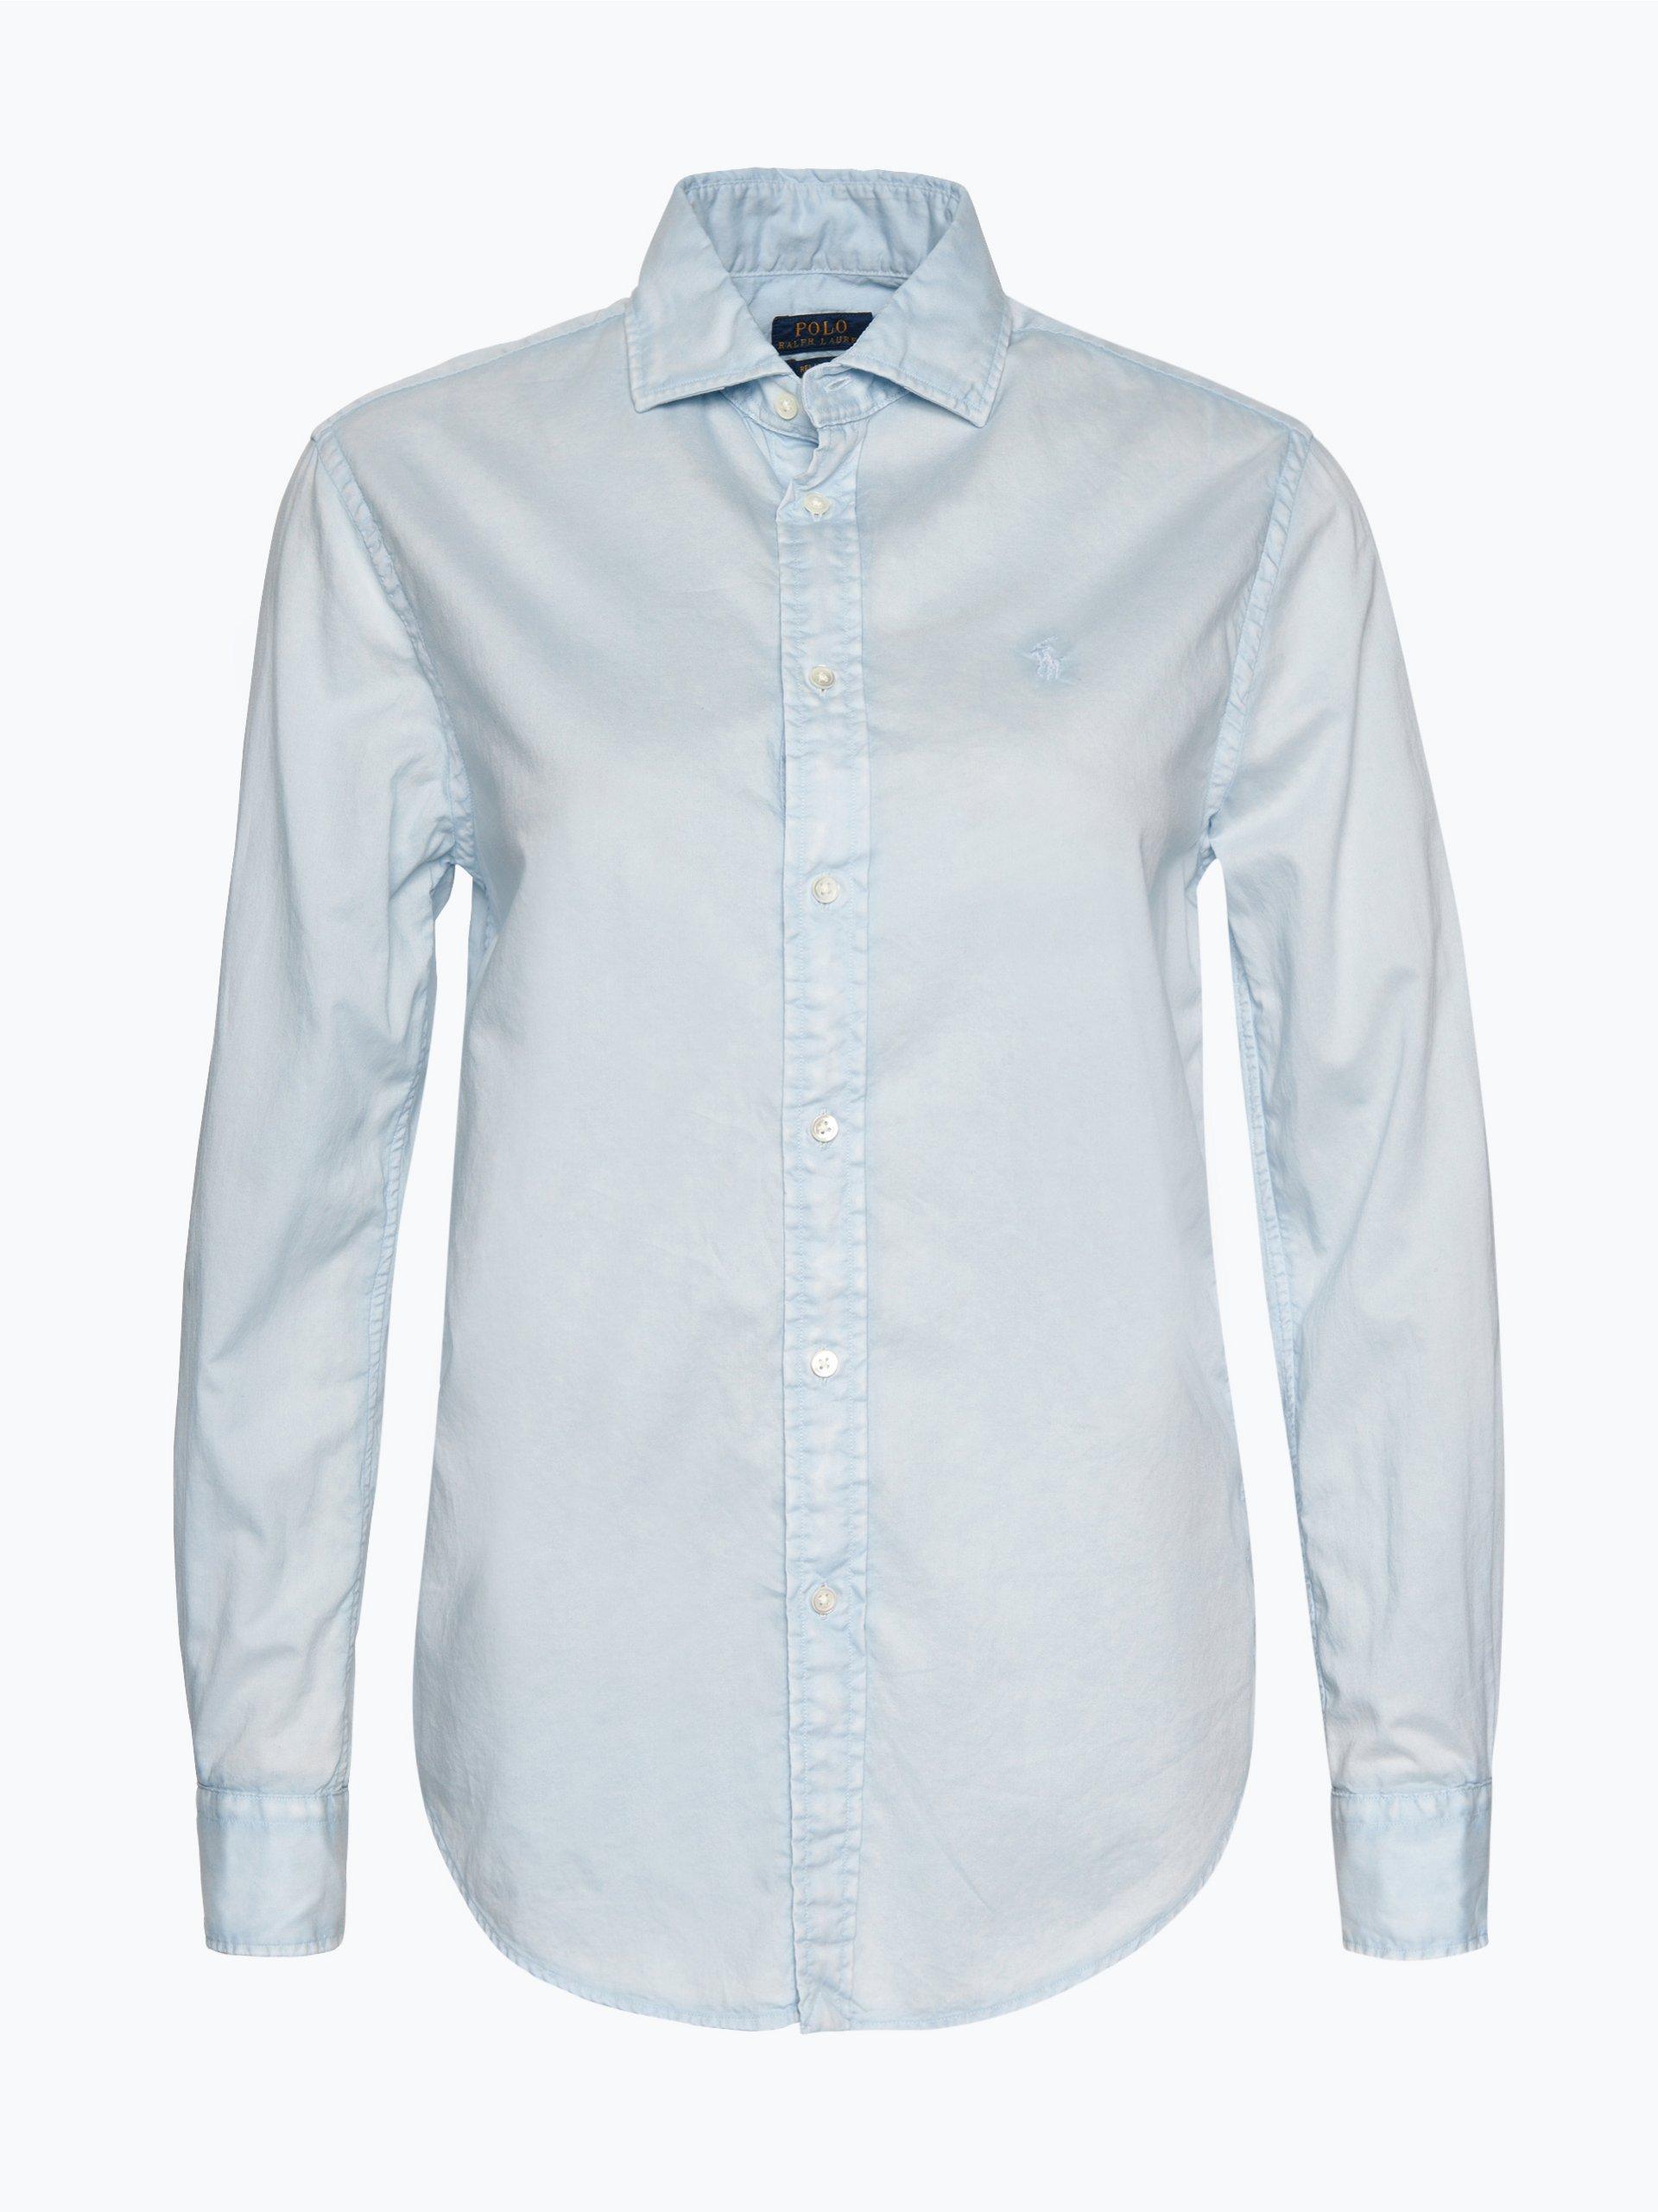 Polo Ralph Lauren Damen Bluse